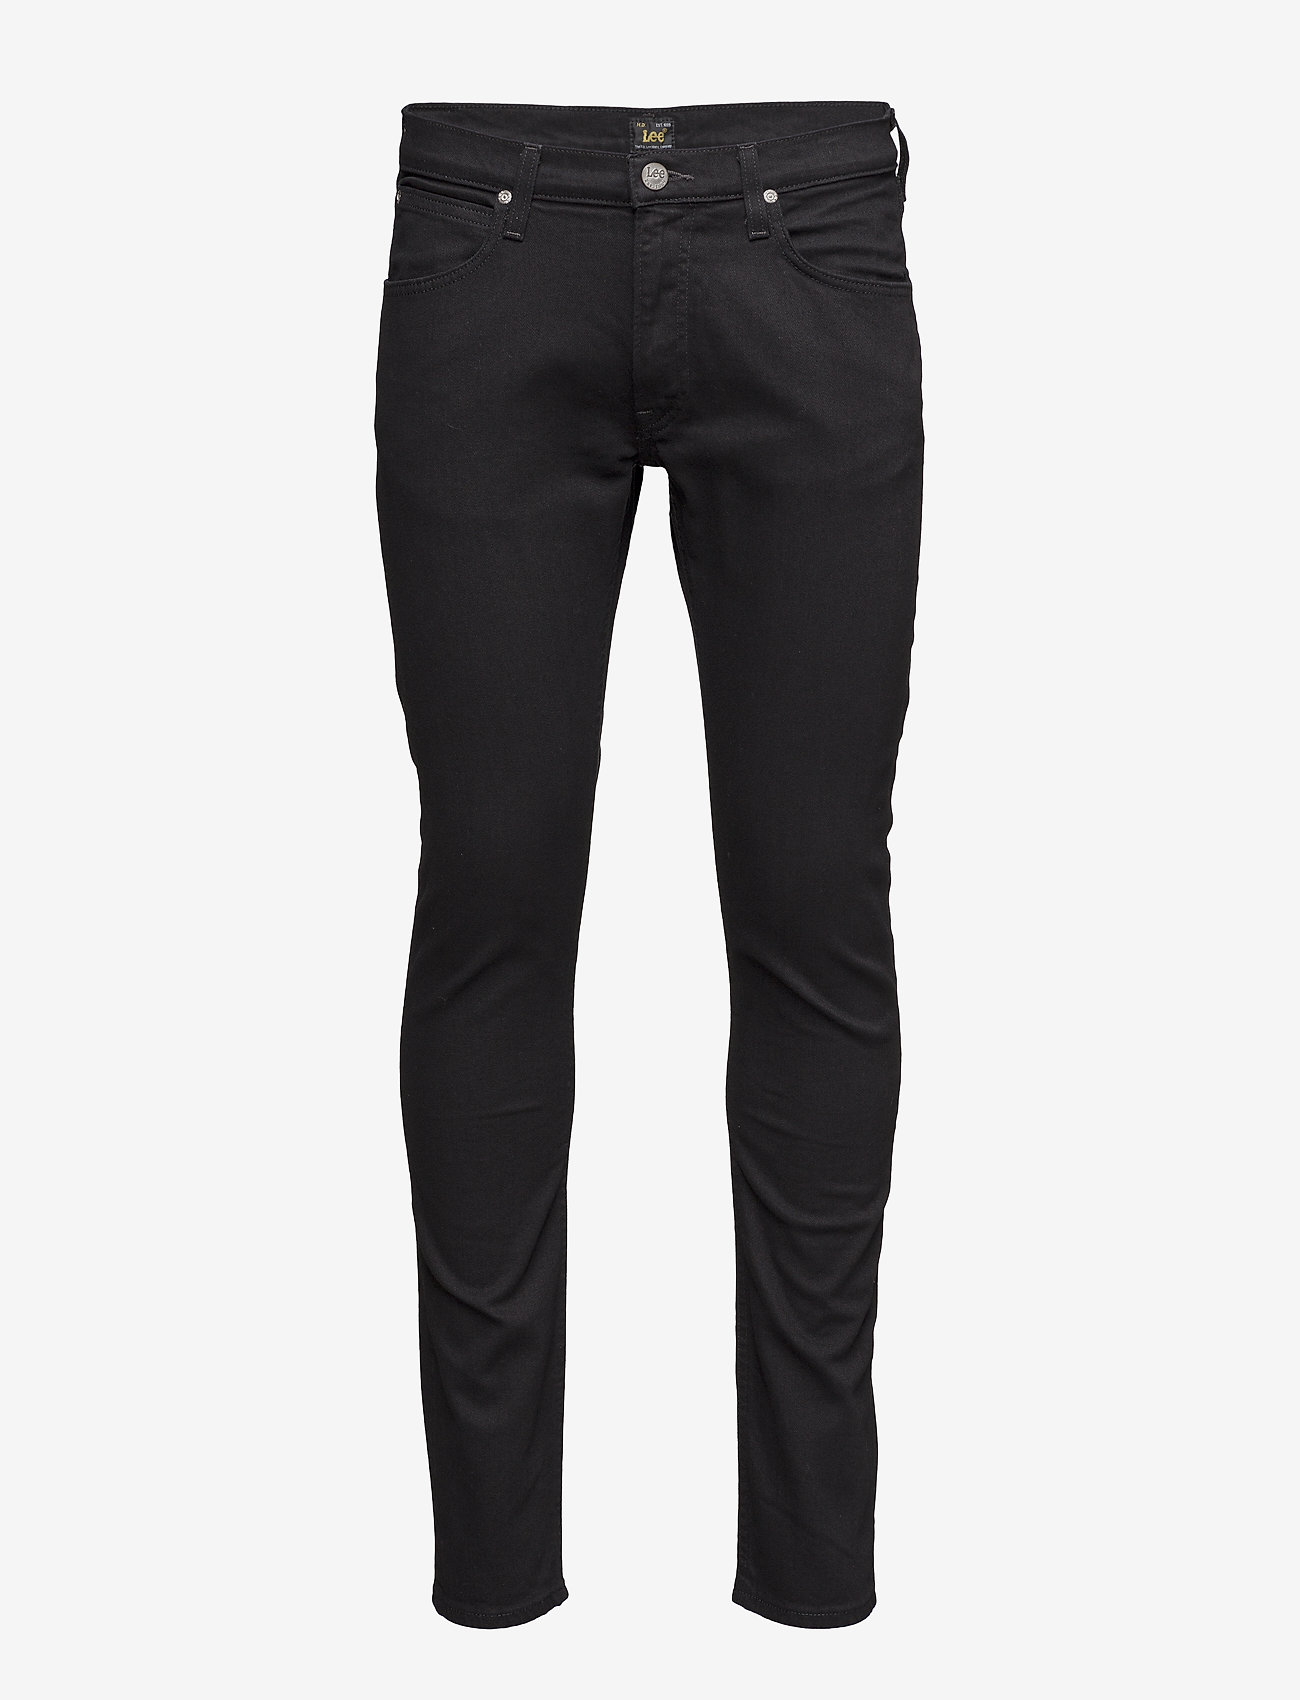 Lee Jeans - LUKE - tapered jeans - clean black - 0